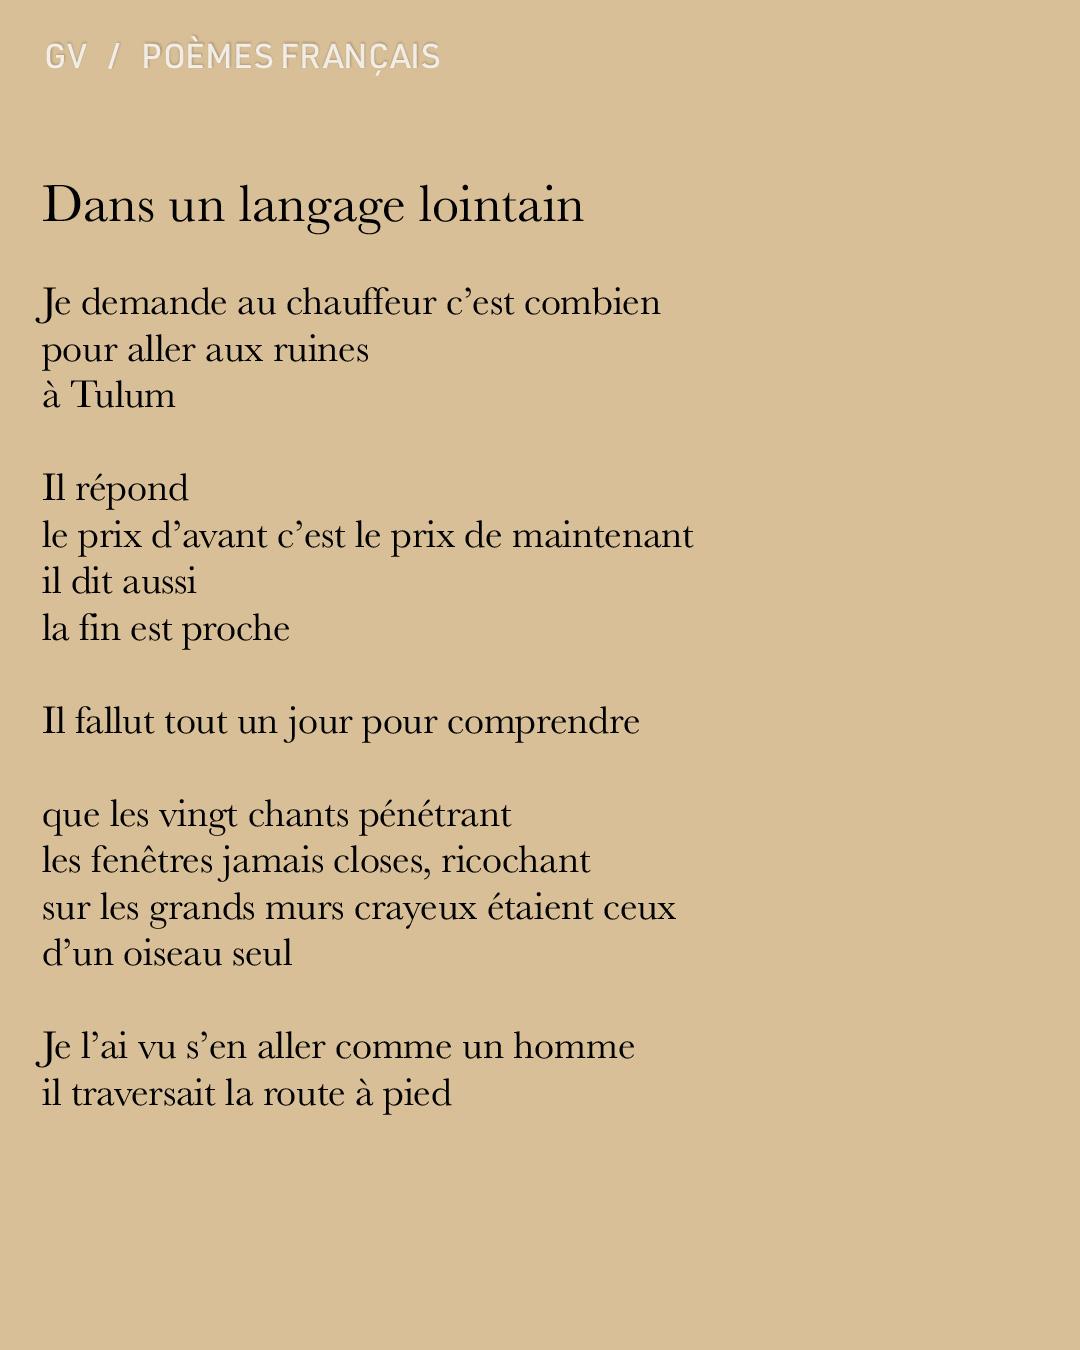 Gvion-PoemsF-DansUnLanguage.jpg